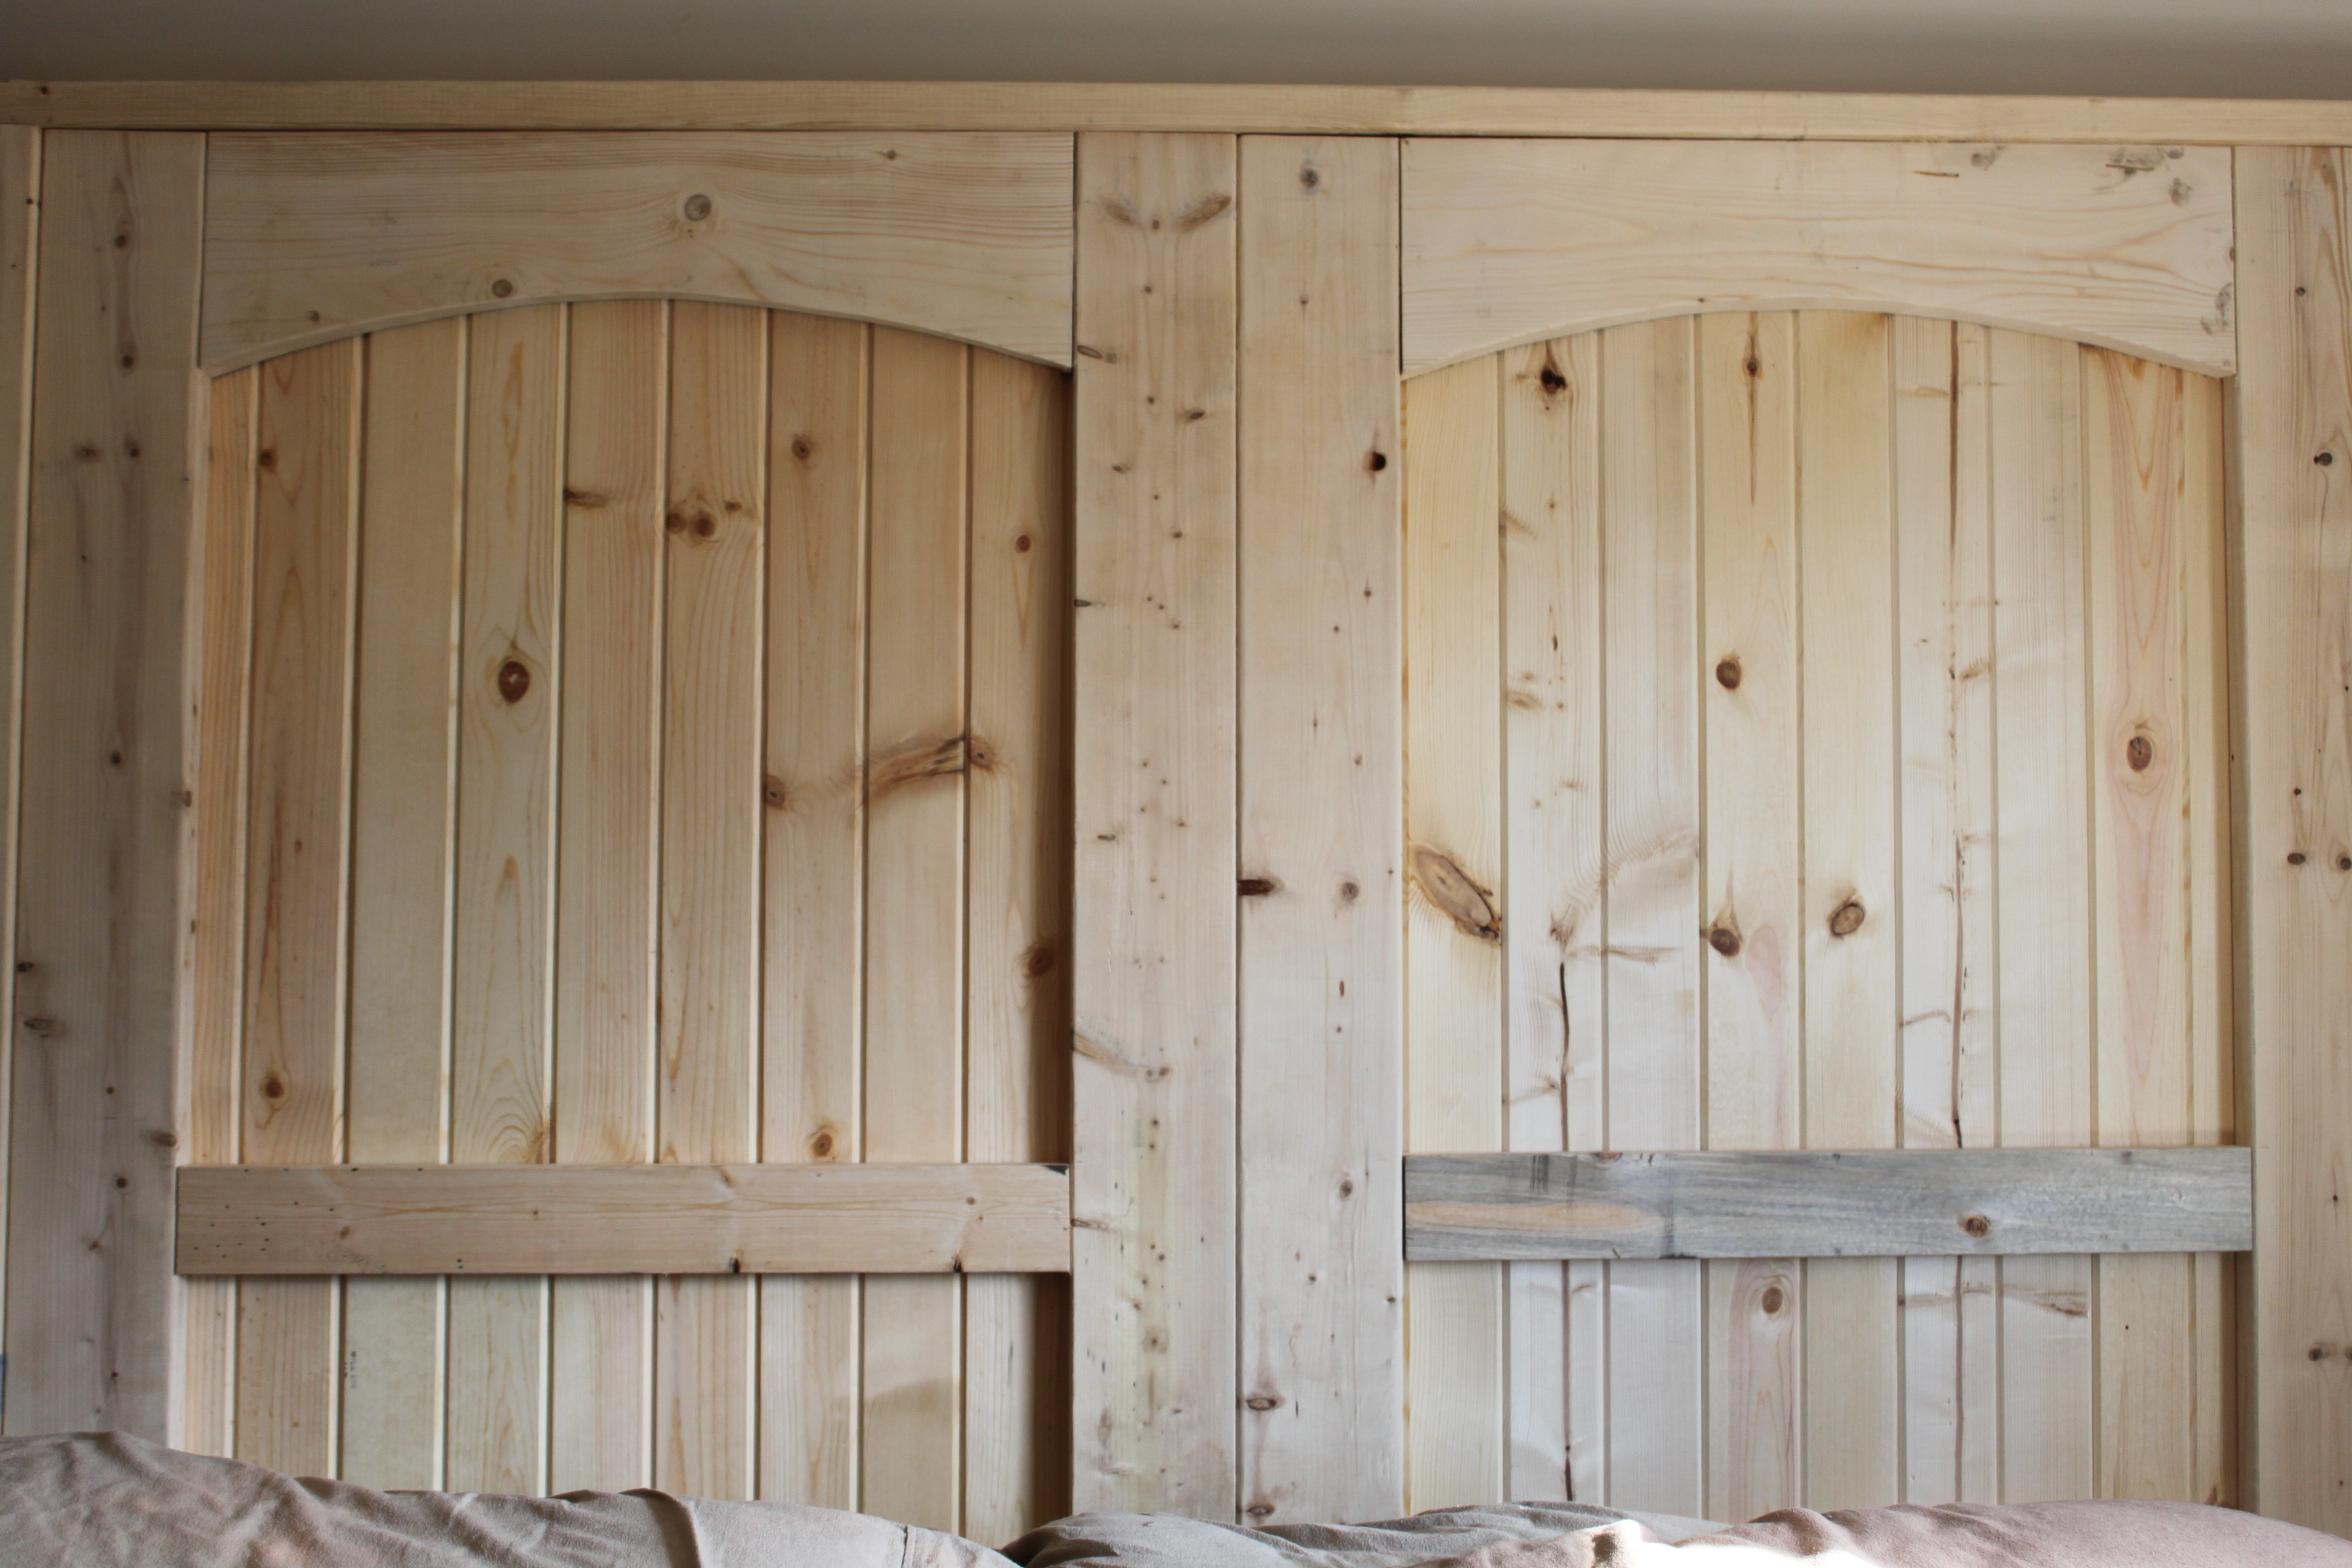 how to build a rustic barn door headboard old world. Black Bedroom Furniture Sets. Home Design Ideas